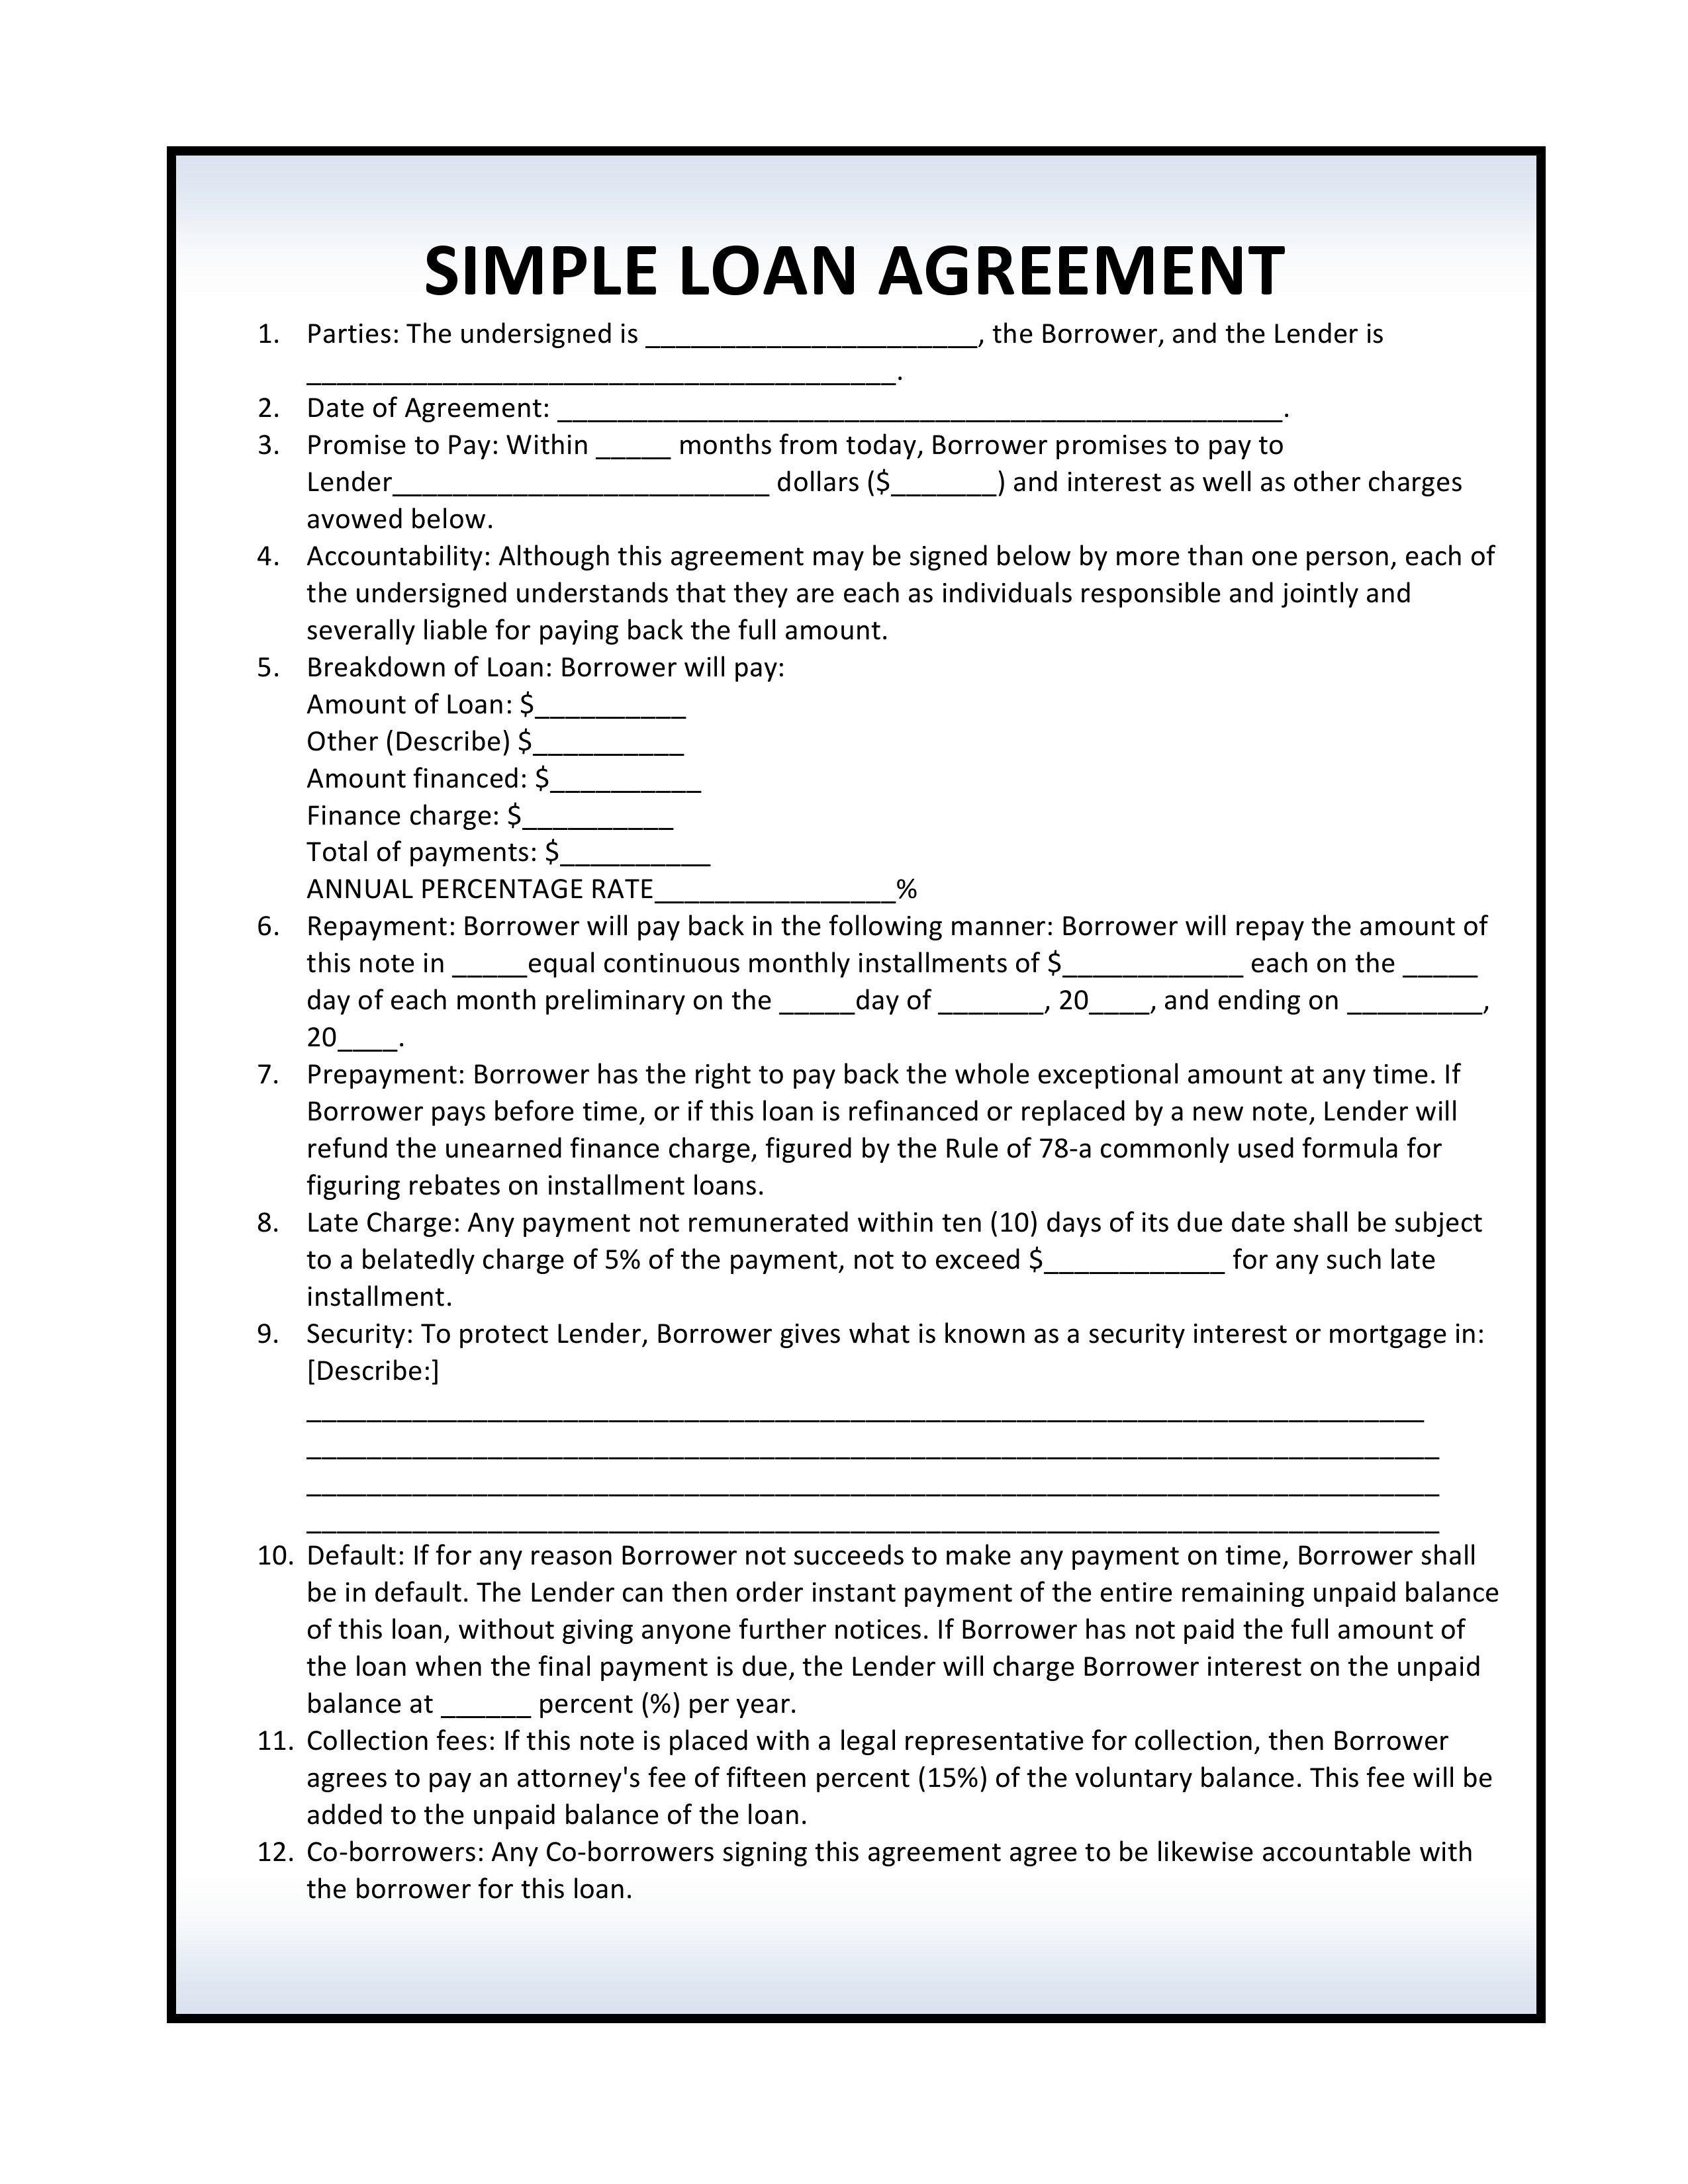 Simple Loan Agreement  Telugu  Resume Template Free Loans For Regarding Free Installment Loan Agreement Template